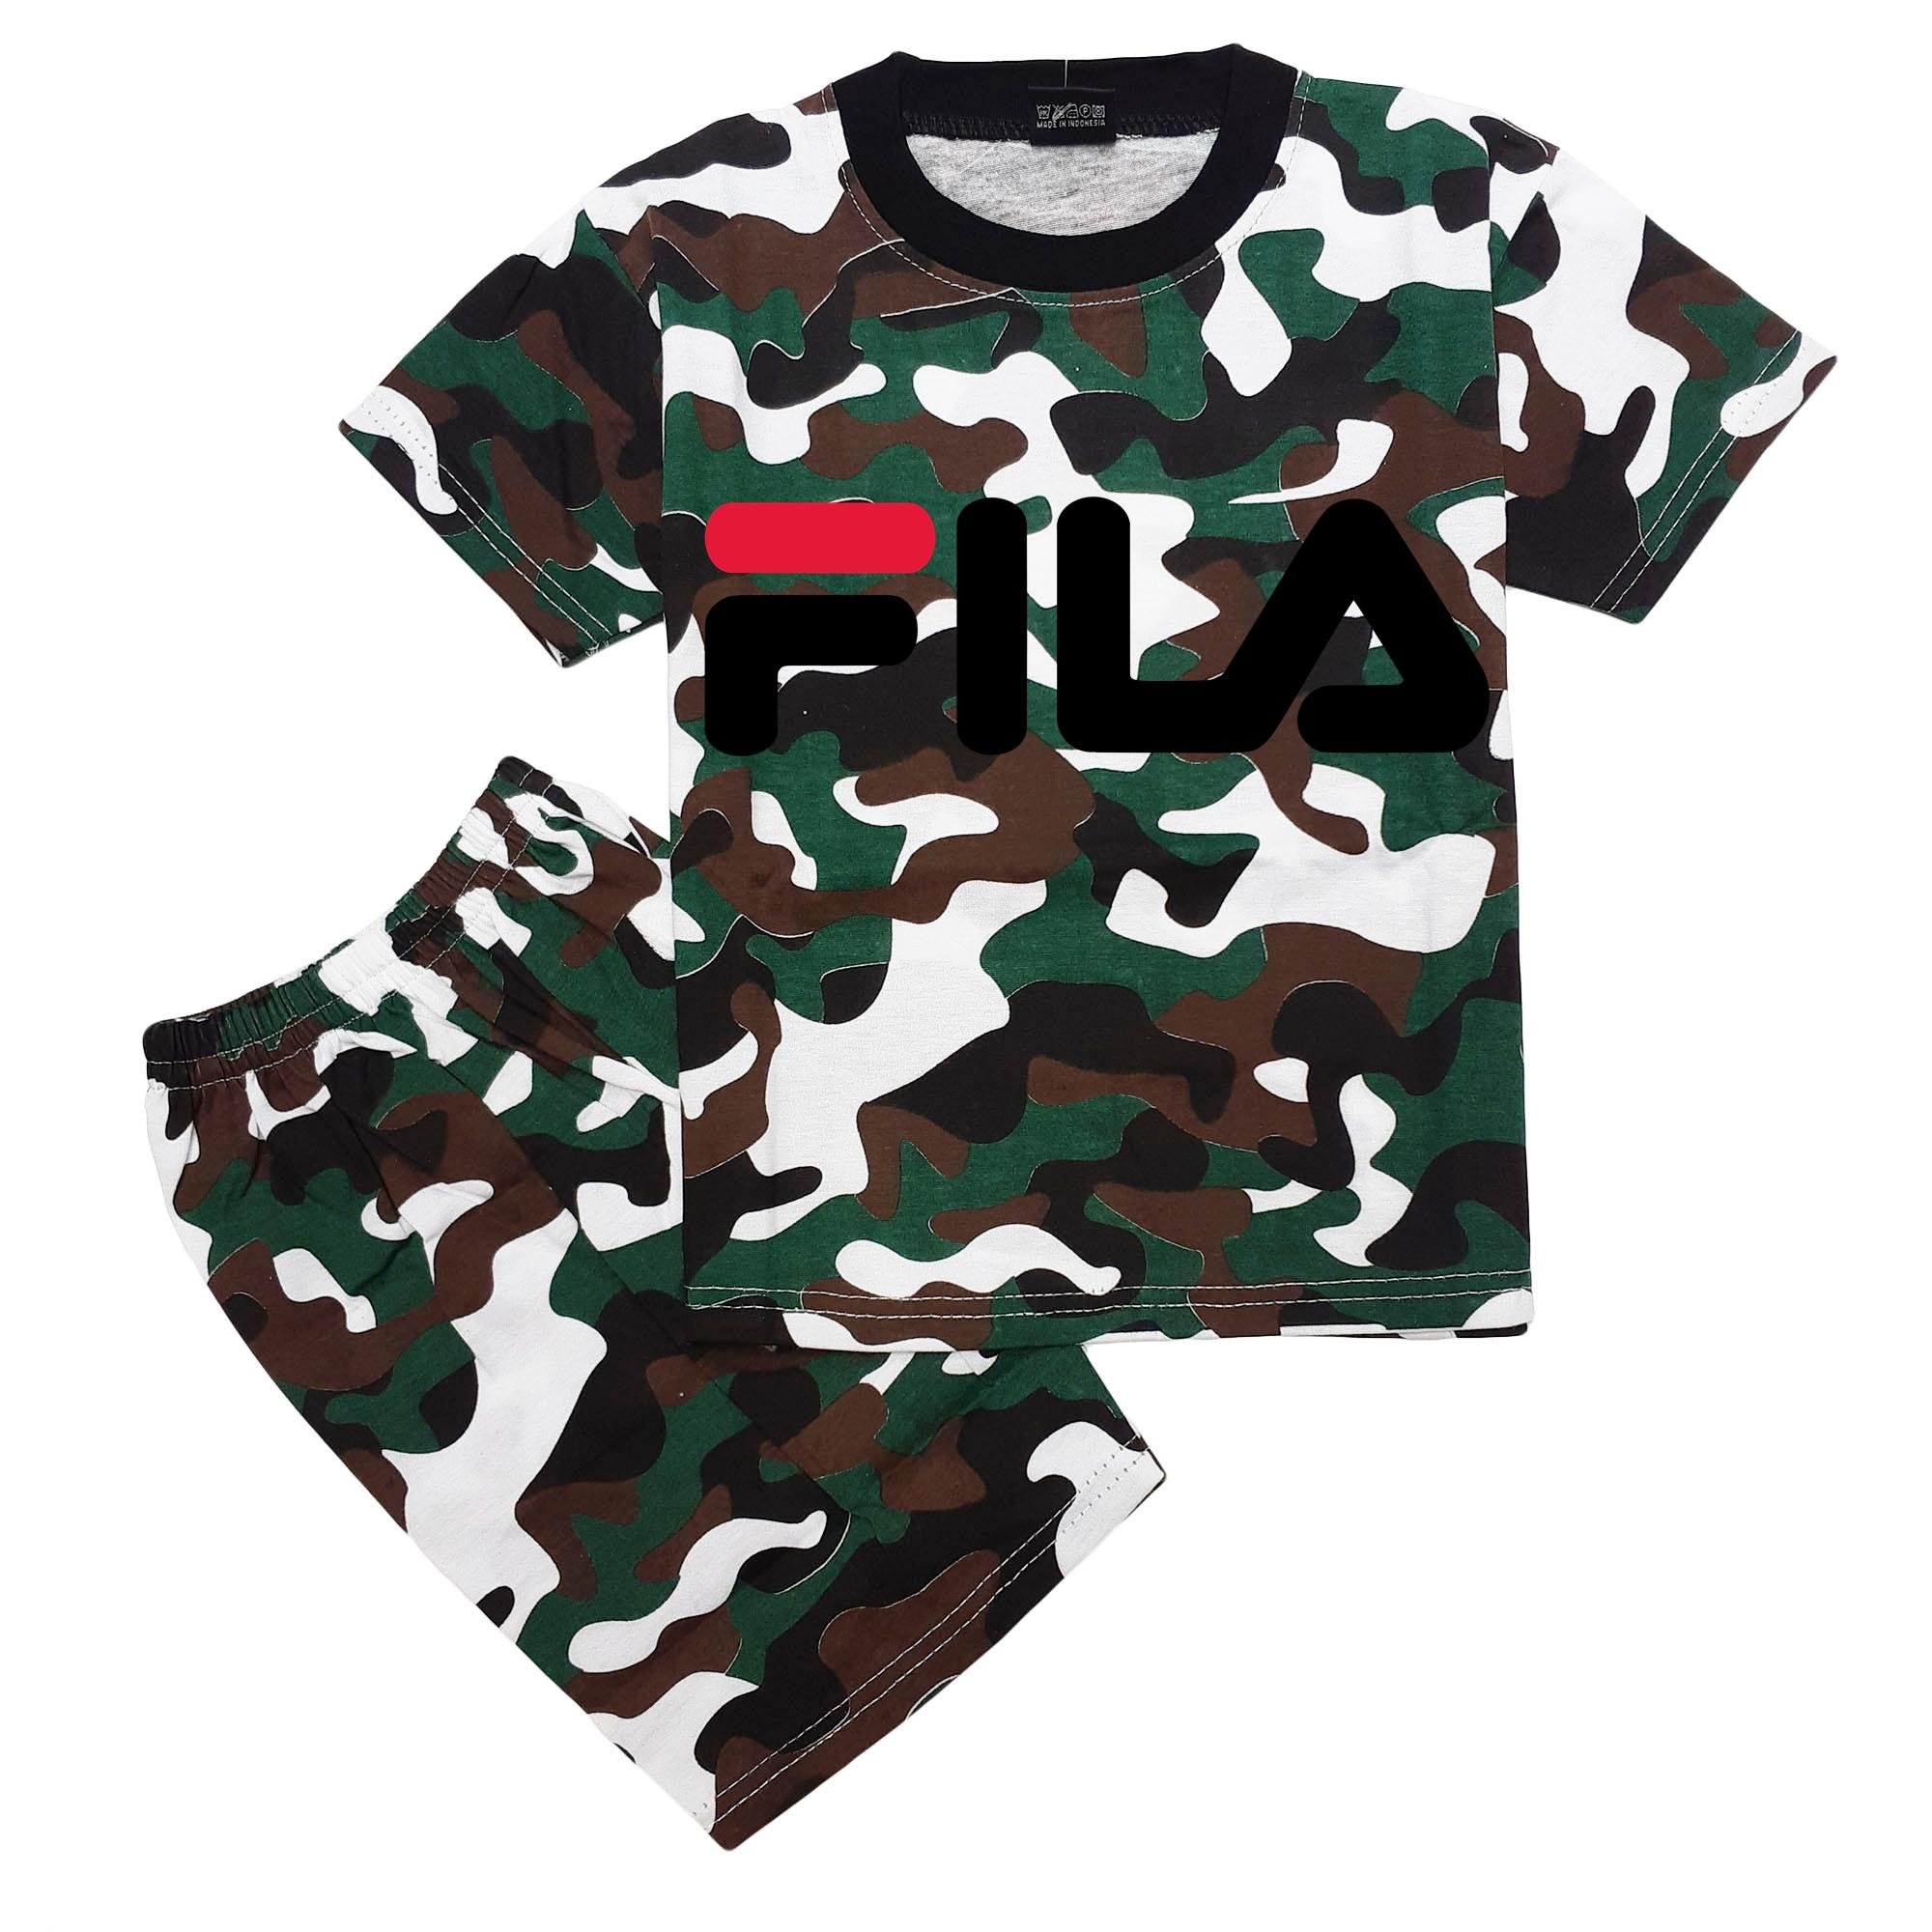 Jual Baju Atasan Anak Laki Laki Lazadacoid